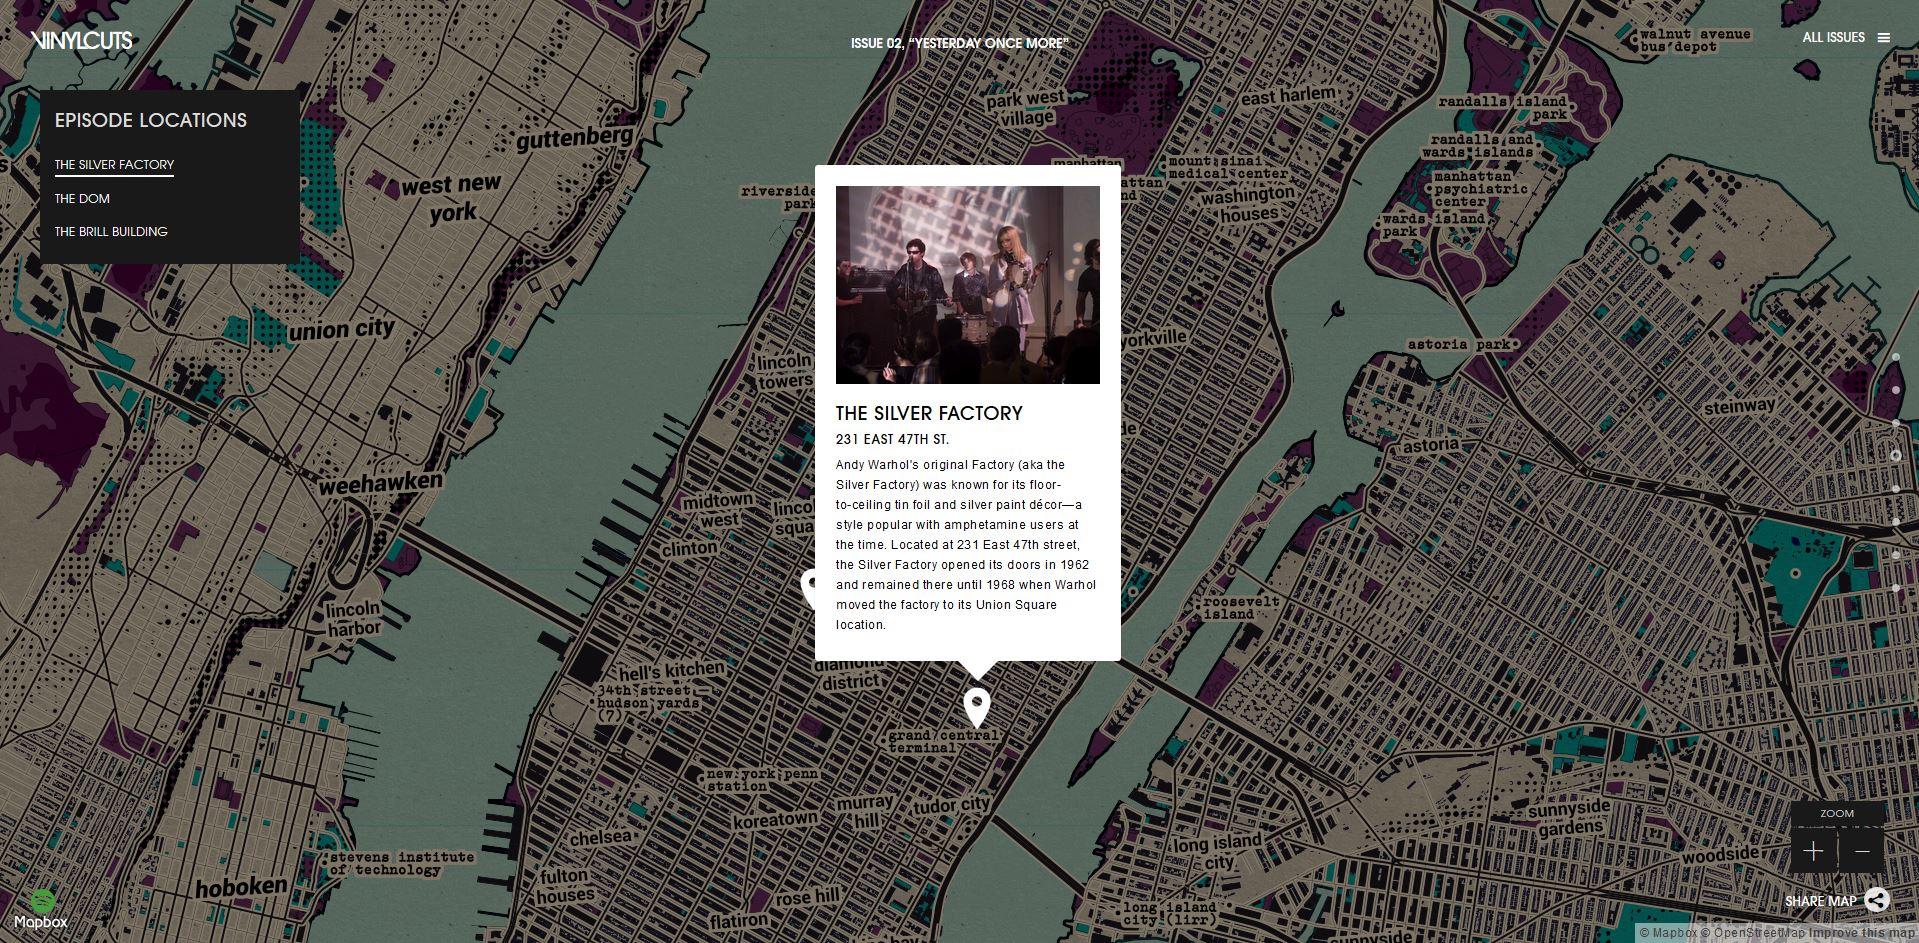 vinylcuts_3_map.JPG